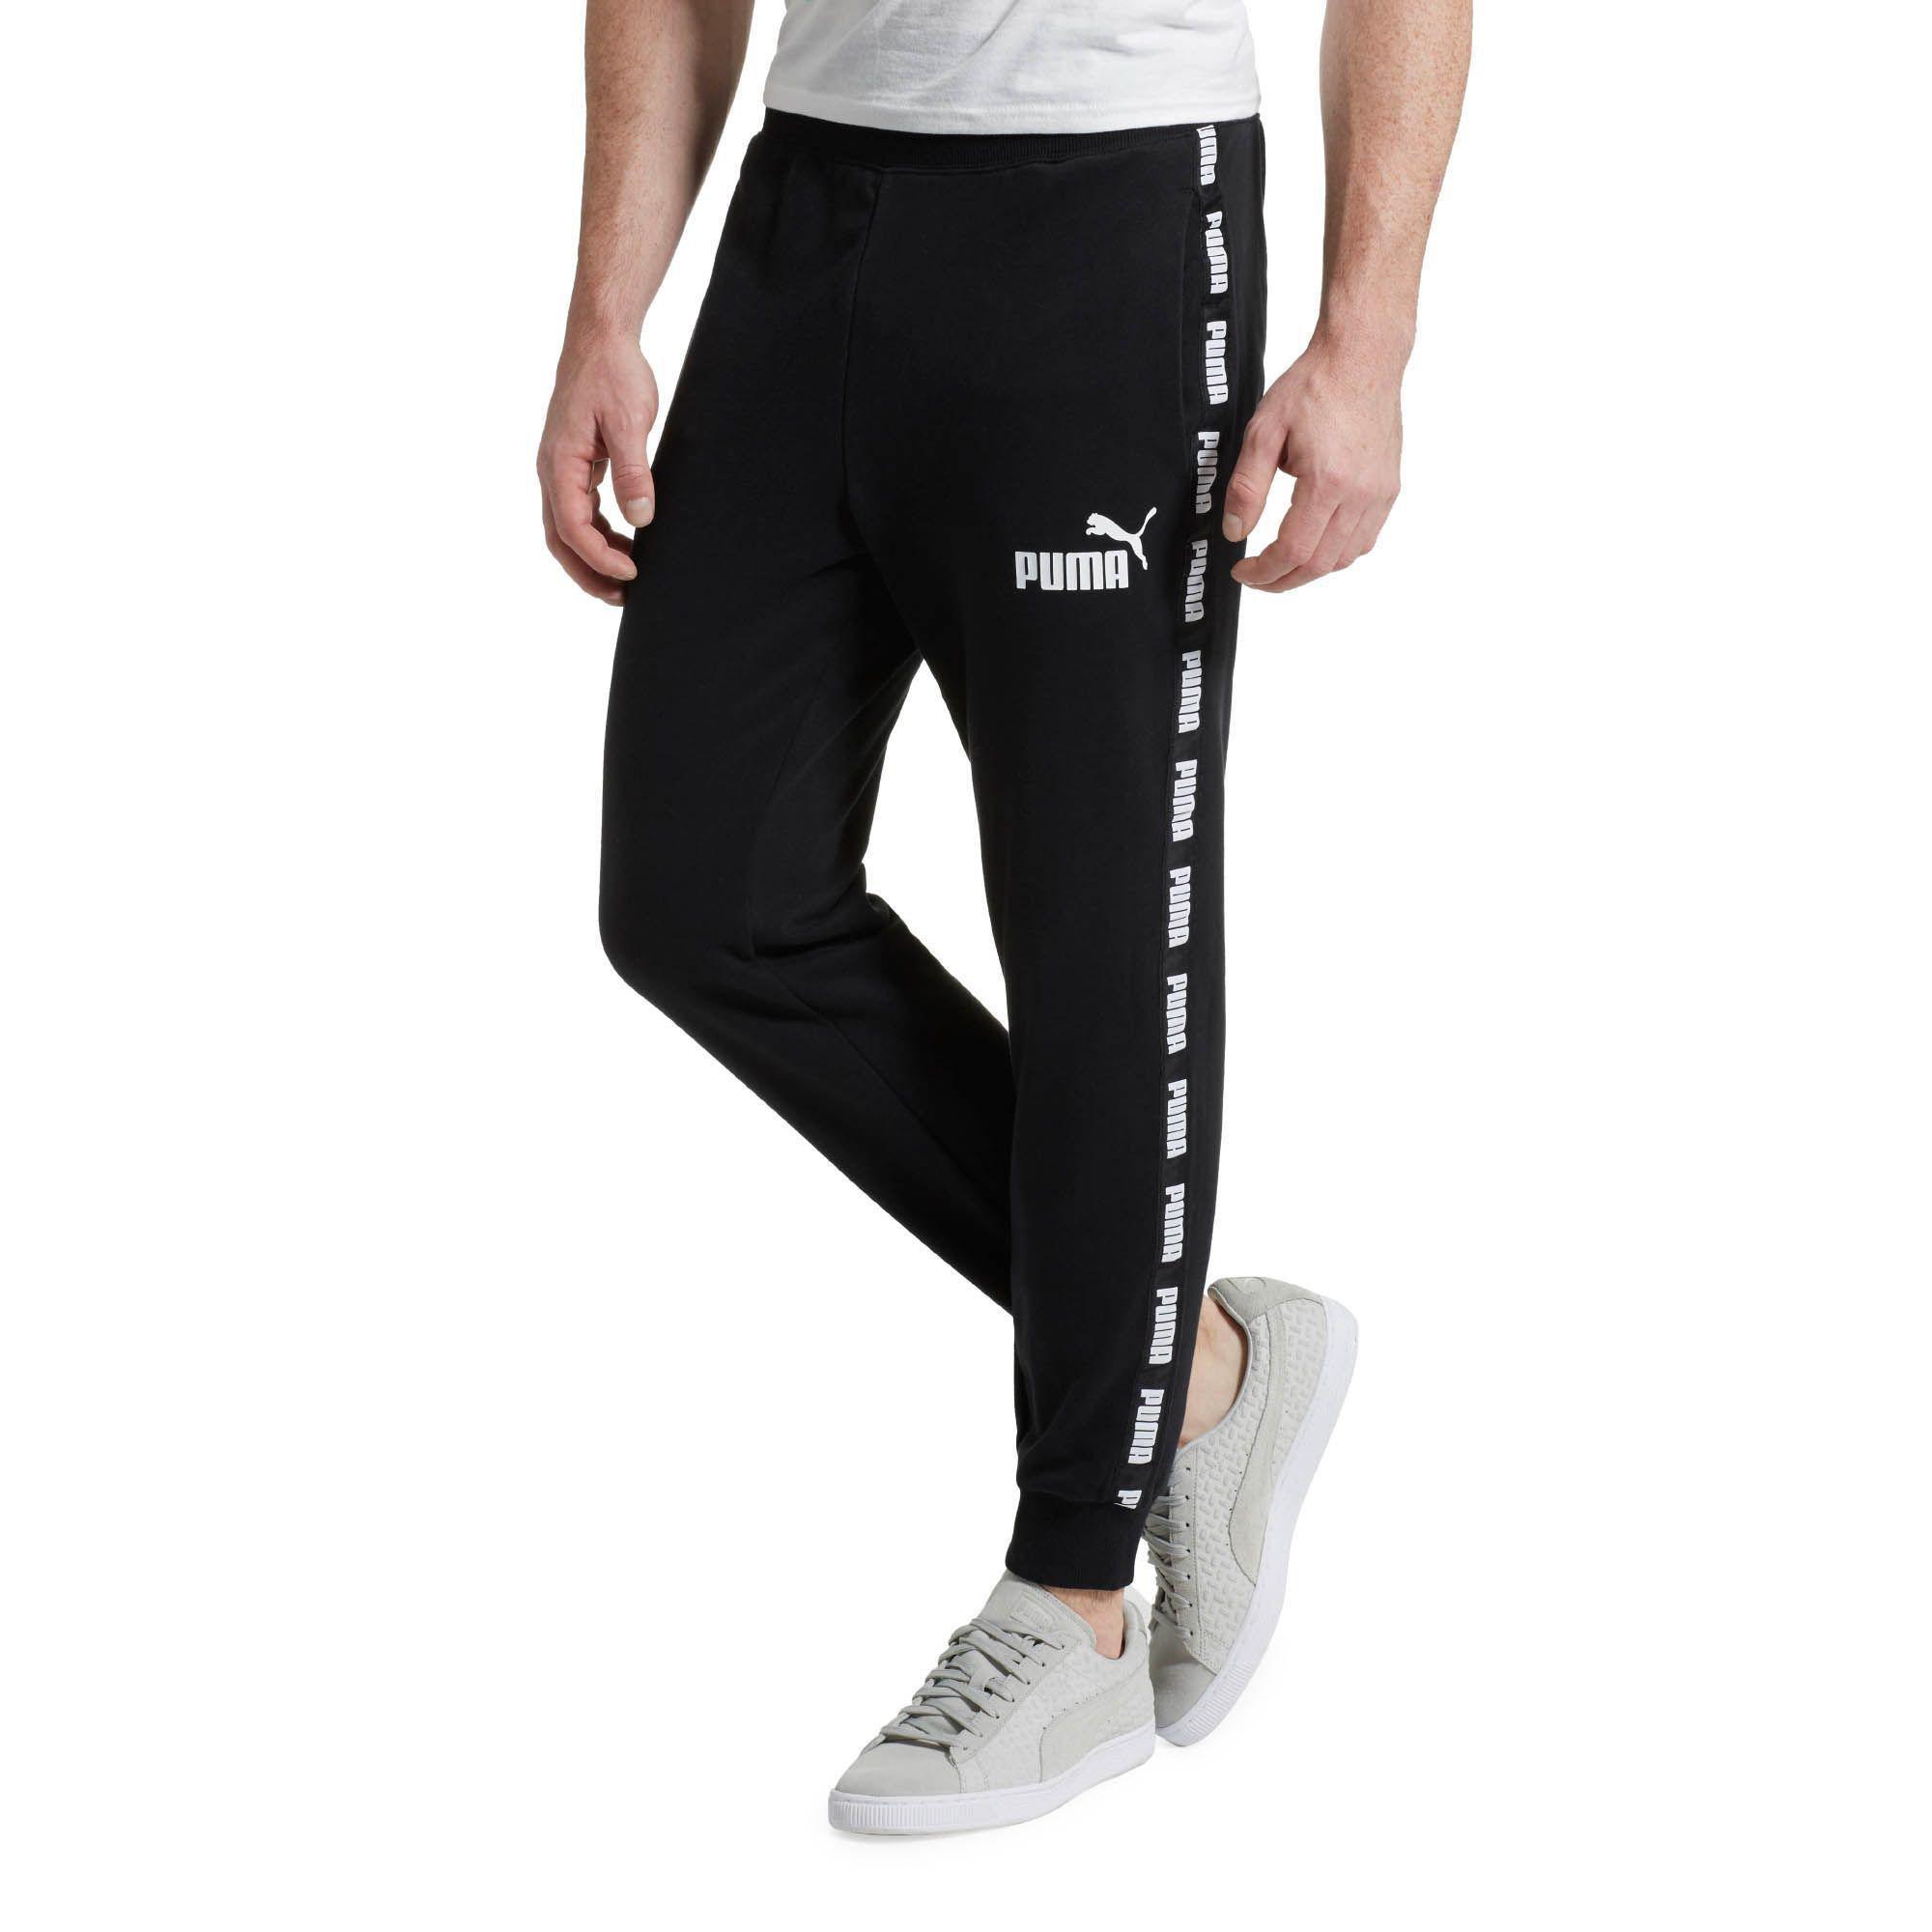 f9bd444edaf2 Lyst - PUMA Power Rebel Sweat Pants in Black for Men